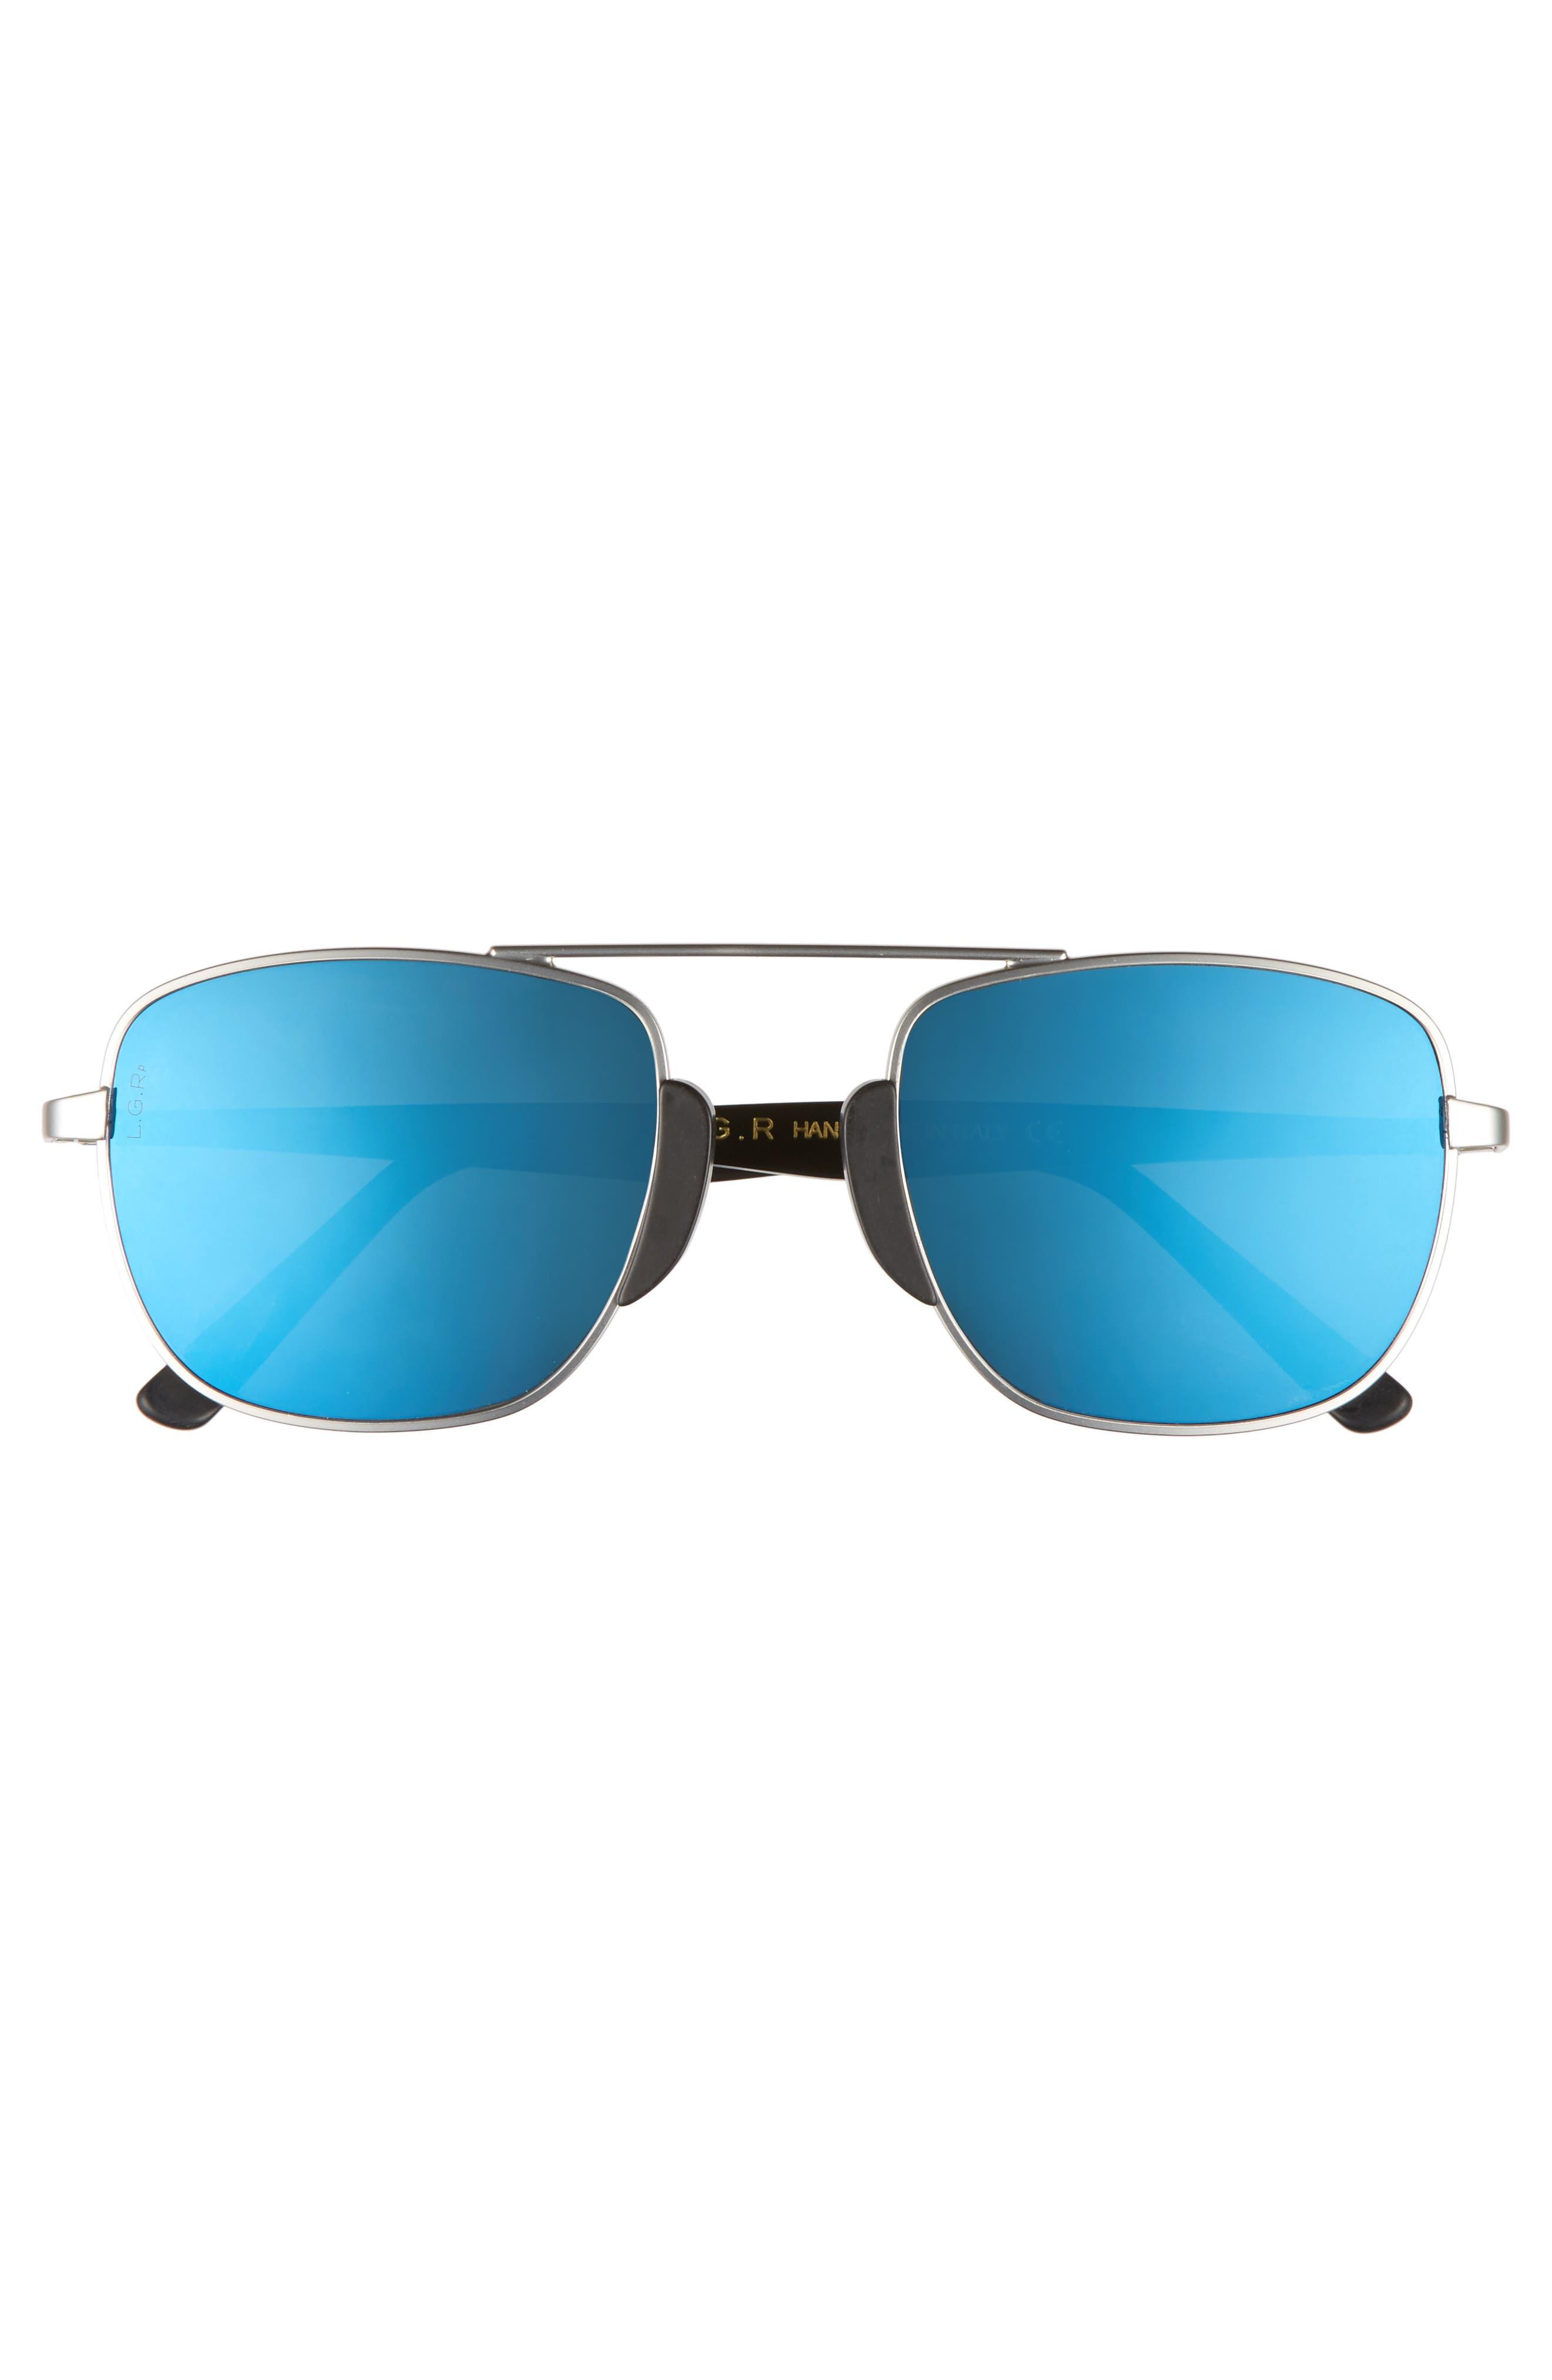 Negus 53mm Polarized Sunglasses,                             Alternate thumbnail 2, color,                             Silver Matte/ Blue Mirror